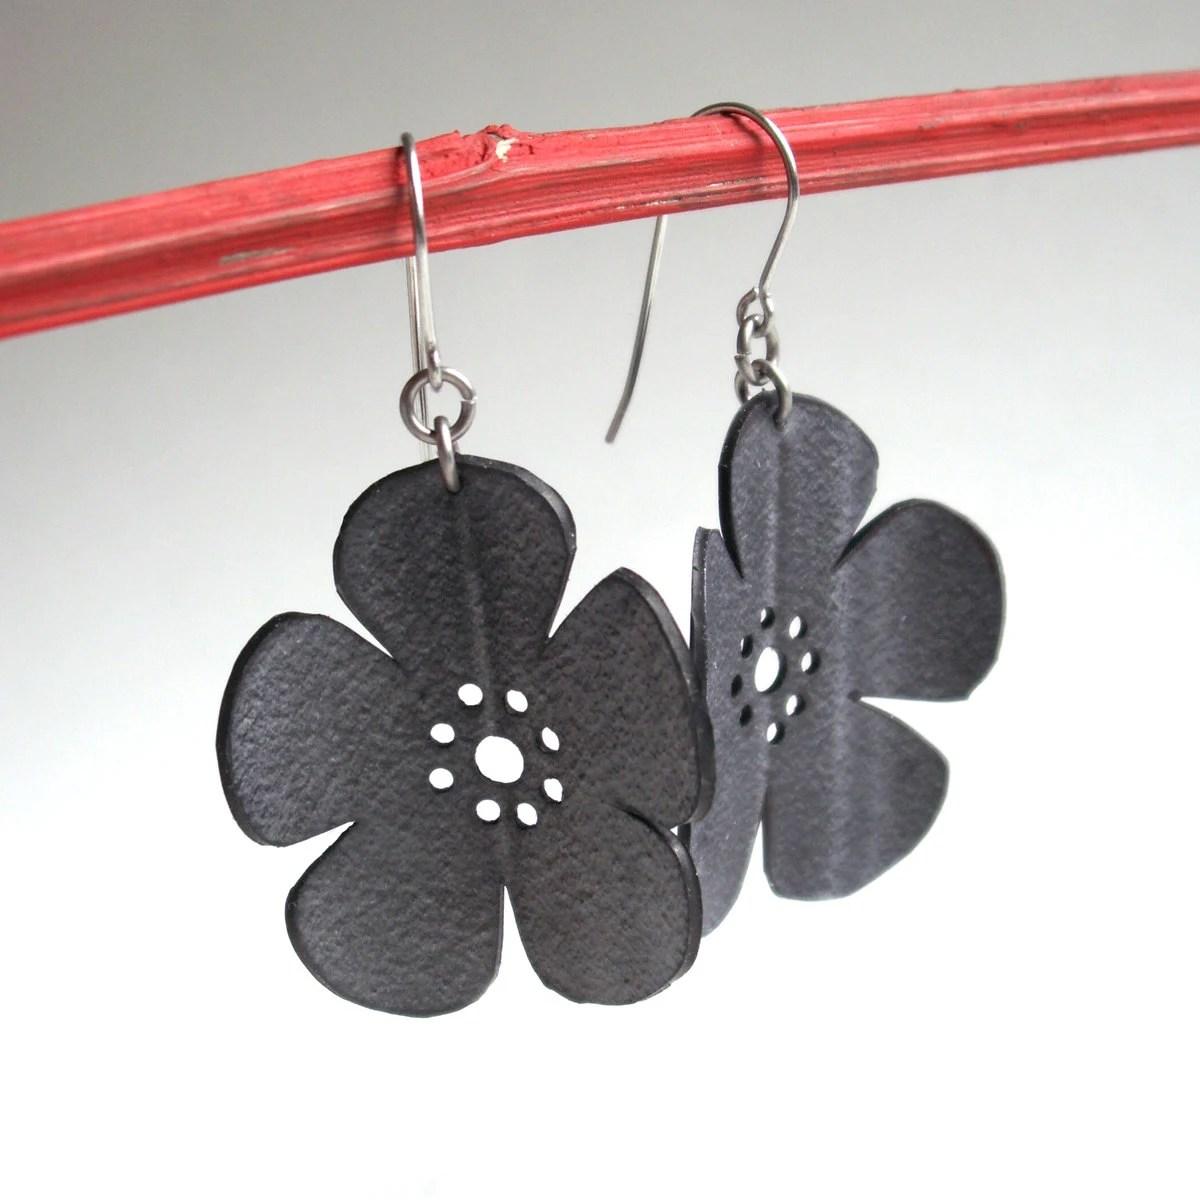 Cherry Blossom Earrings - eco friendly inner tube jewelry - black flower silhouette jewelry - Gloomstopper